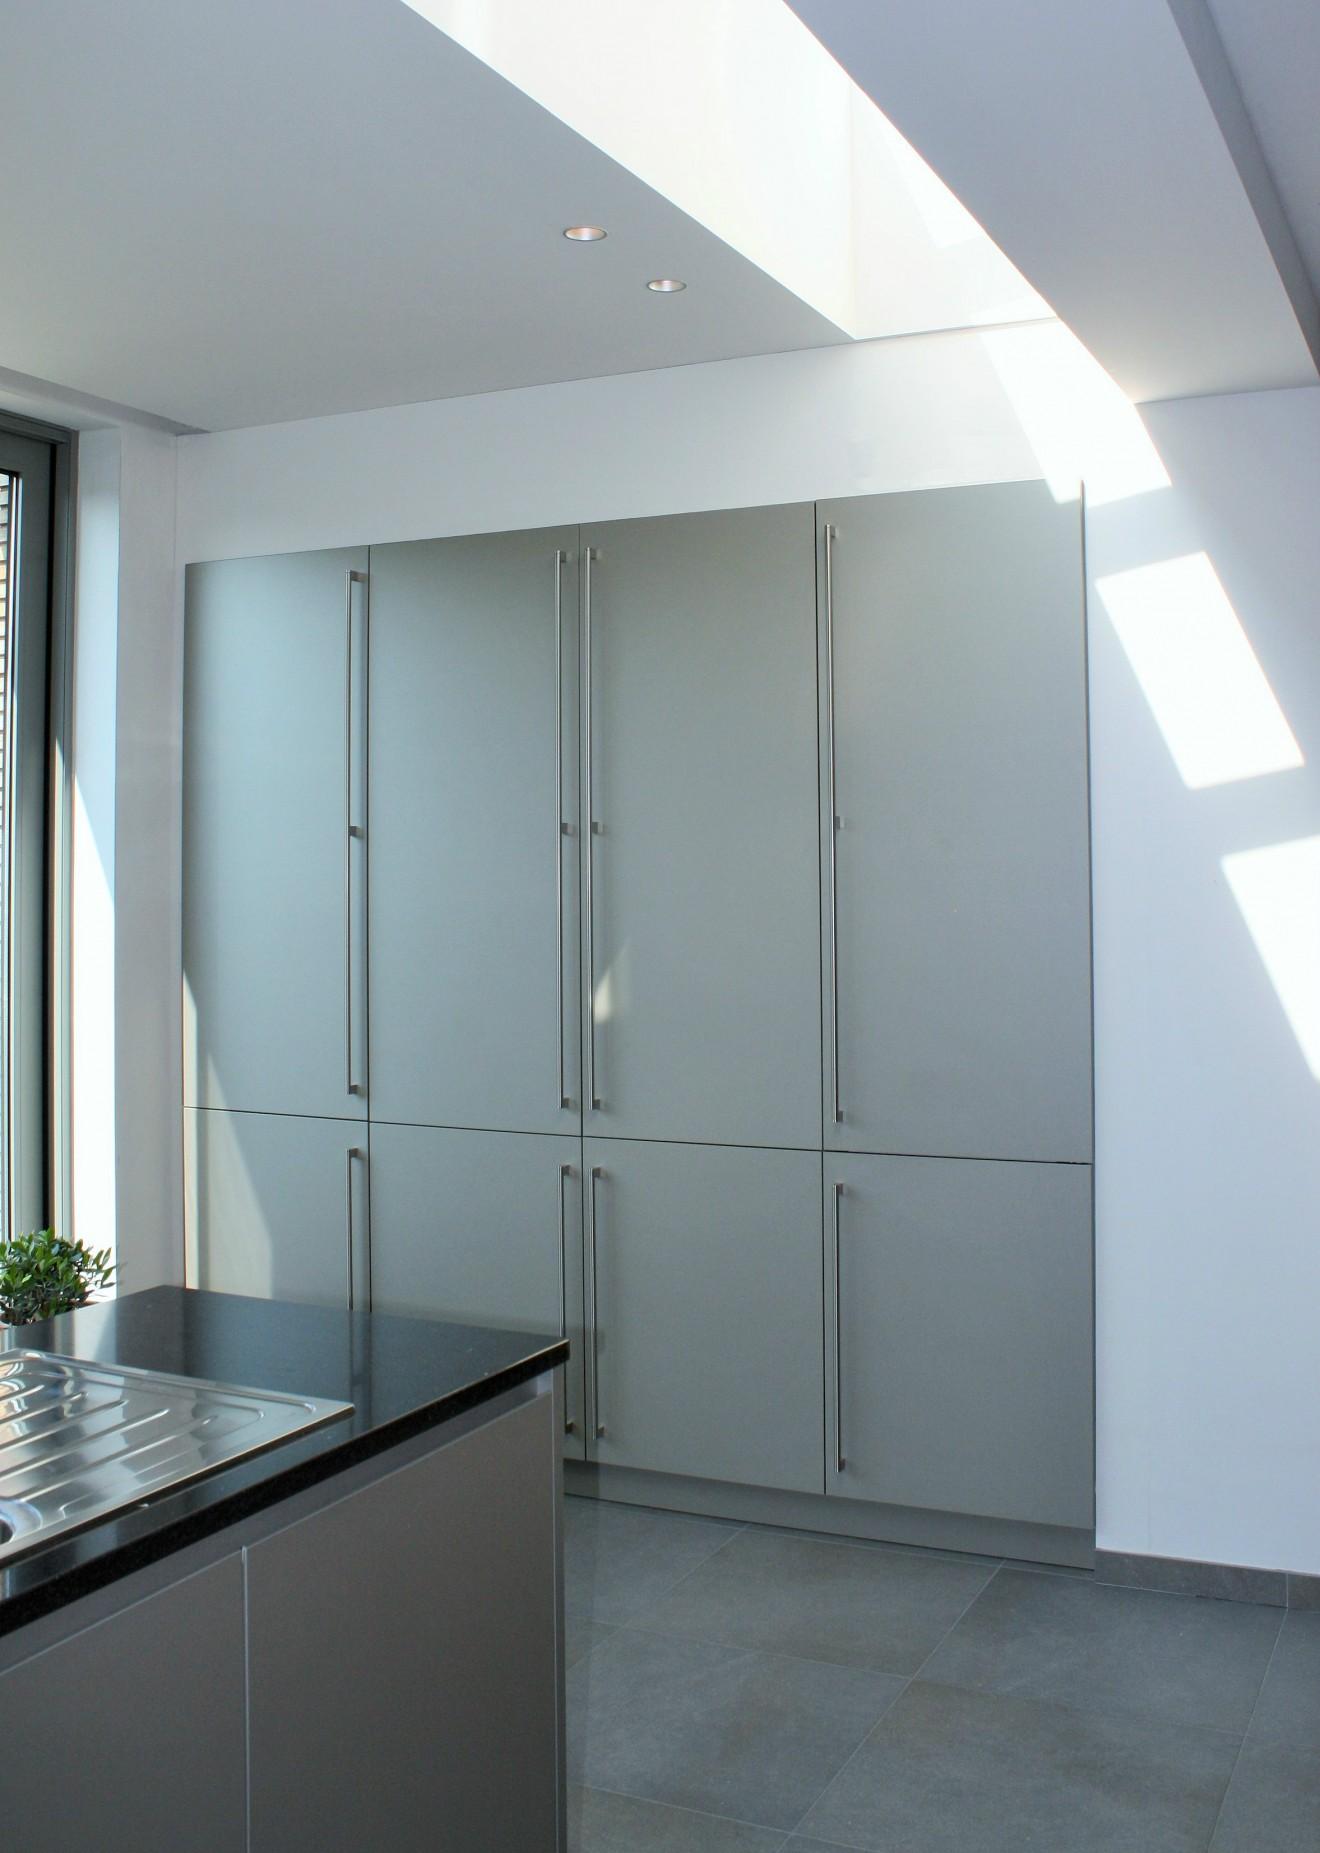 Architect- en ingenieursbureau Andries & Vuylsteke - Verbouwing woning Gent